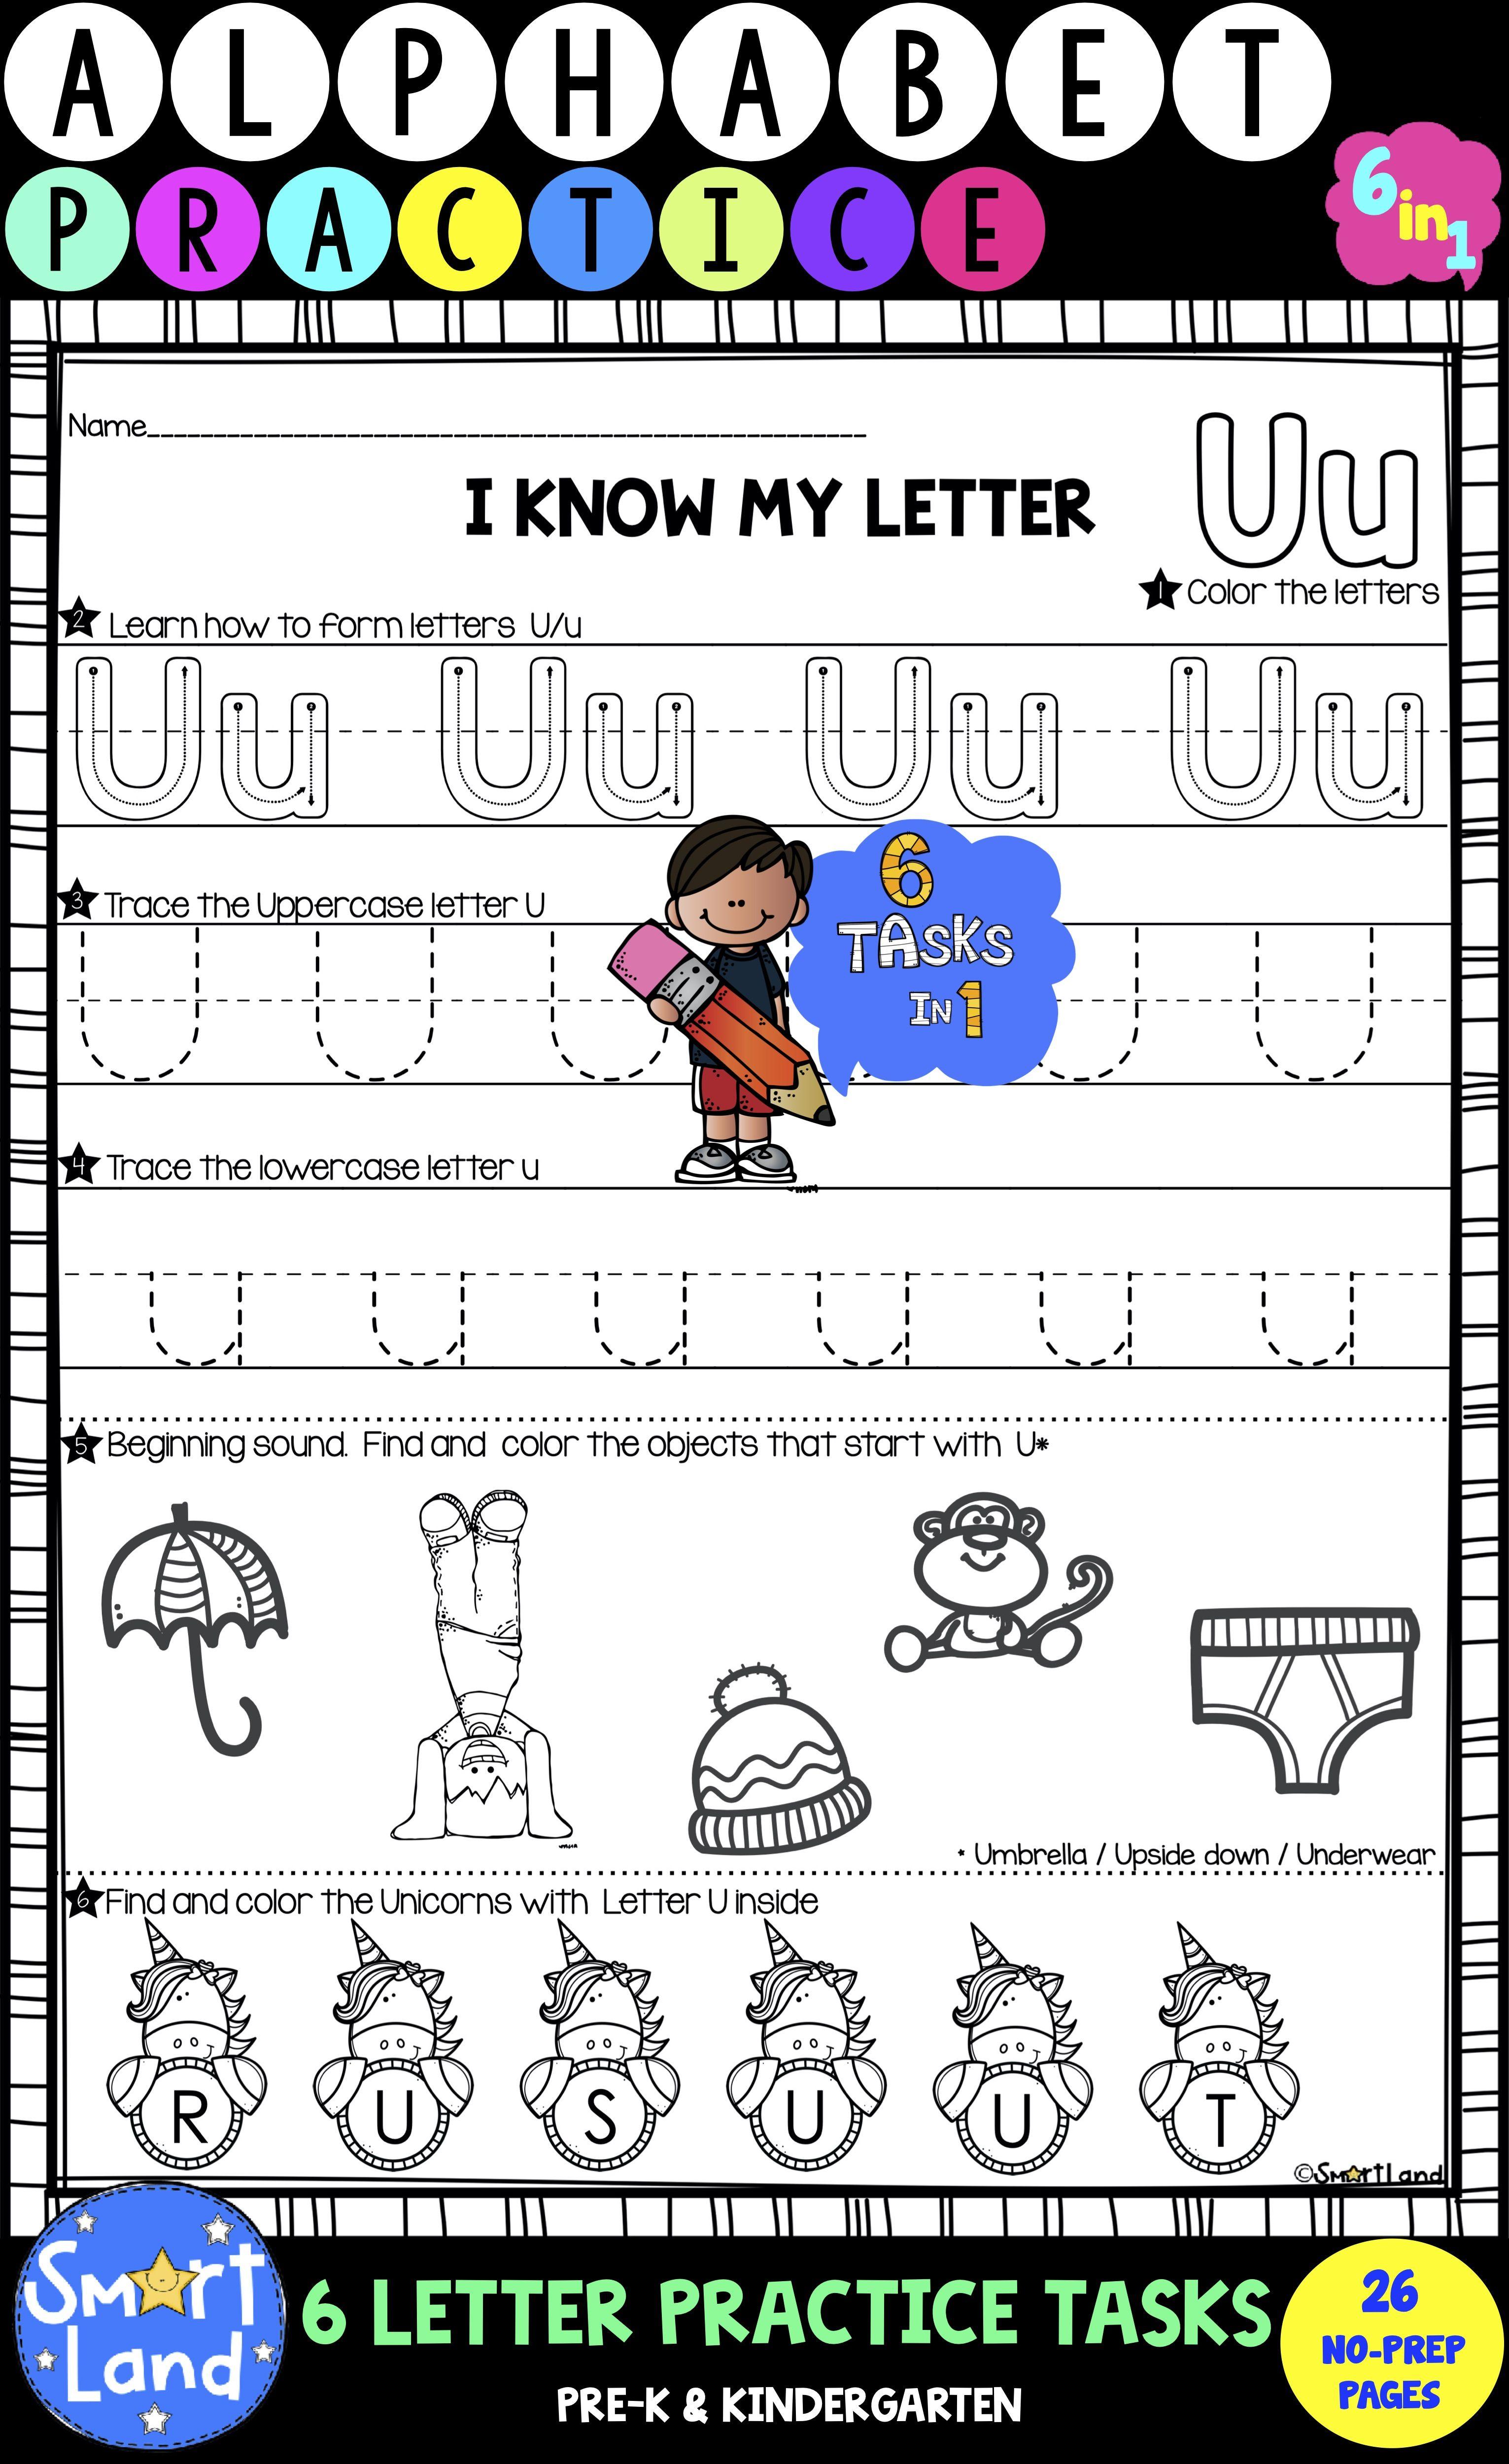 Alphabet Practice 6in1